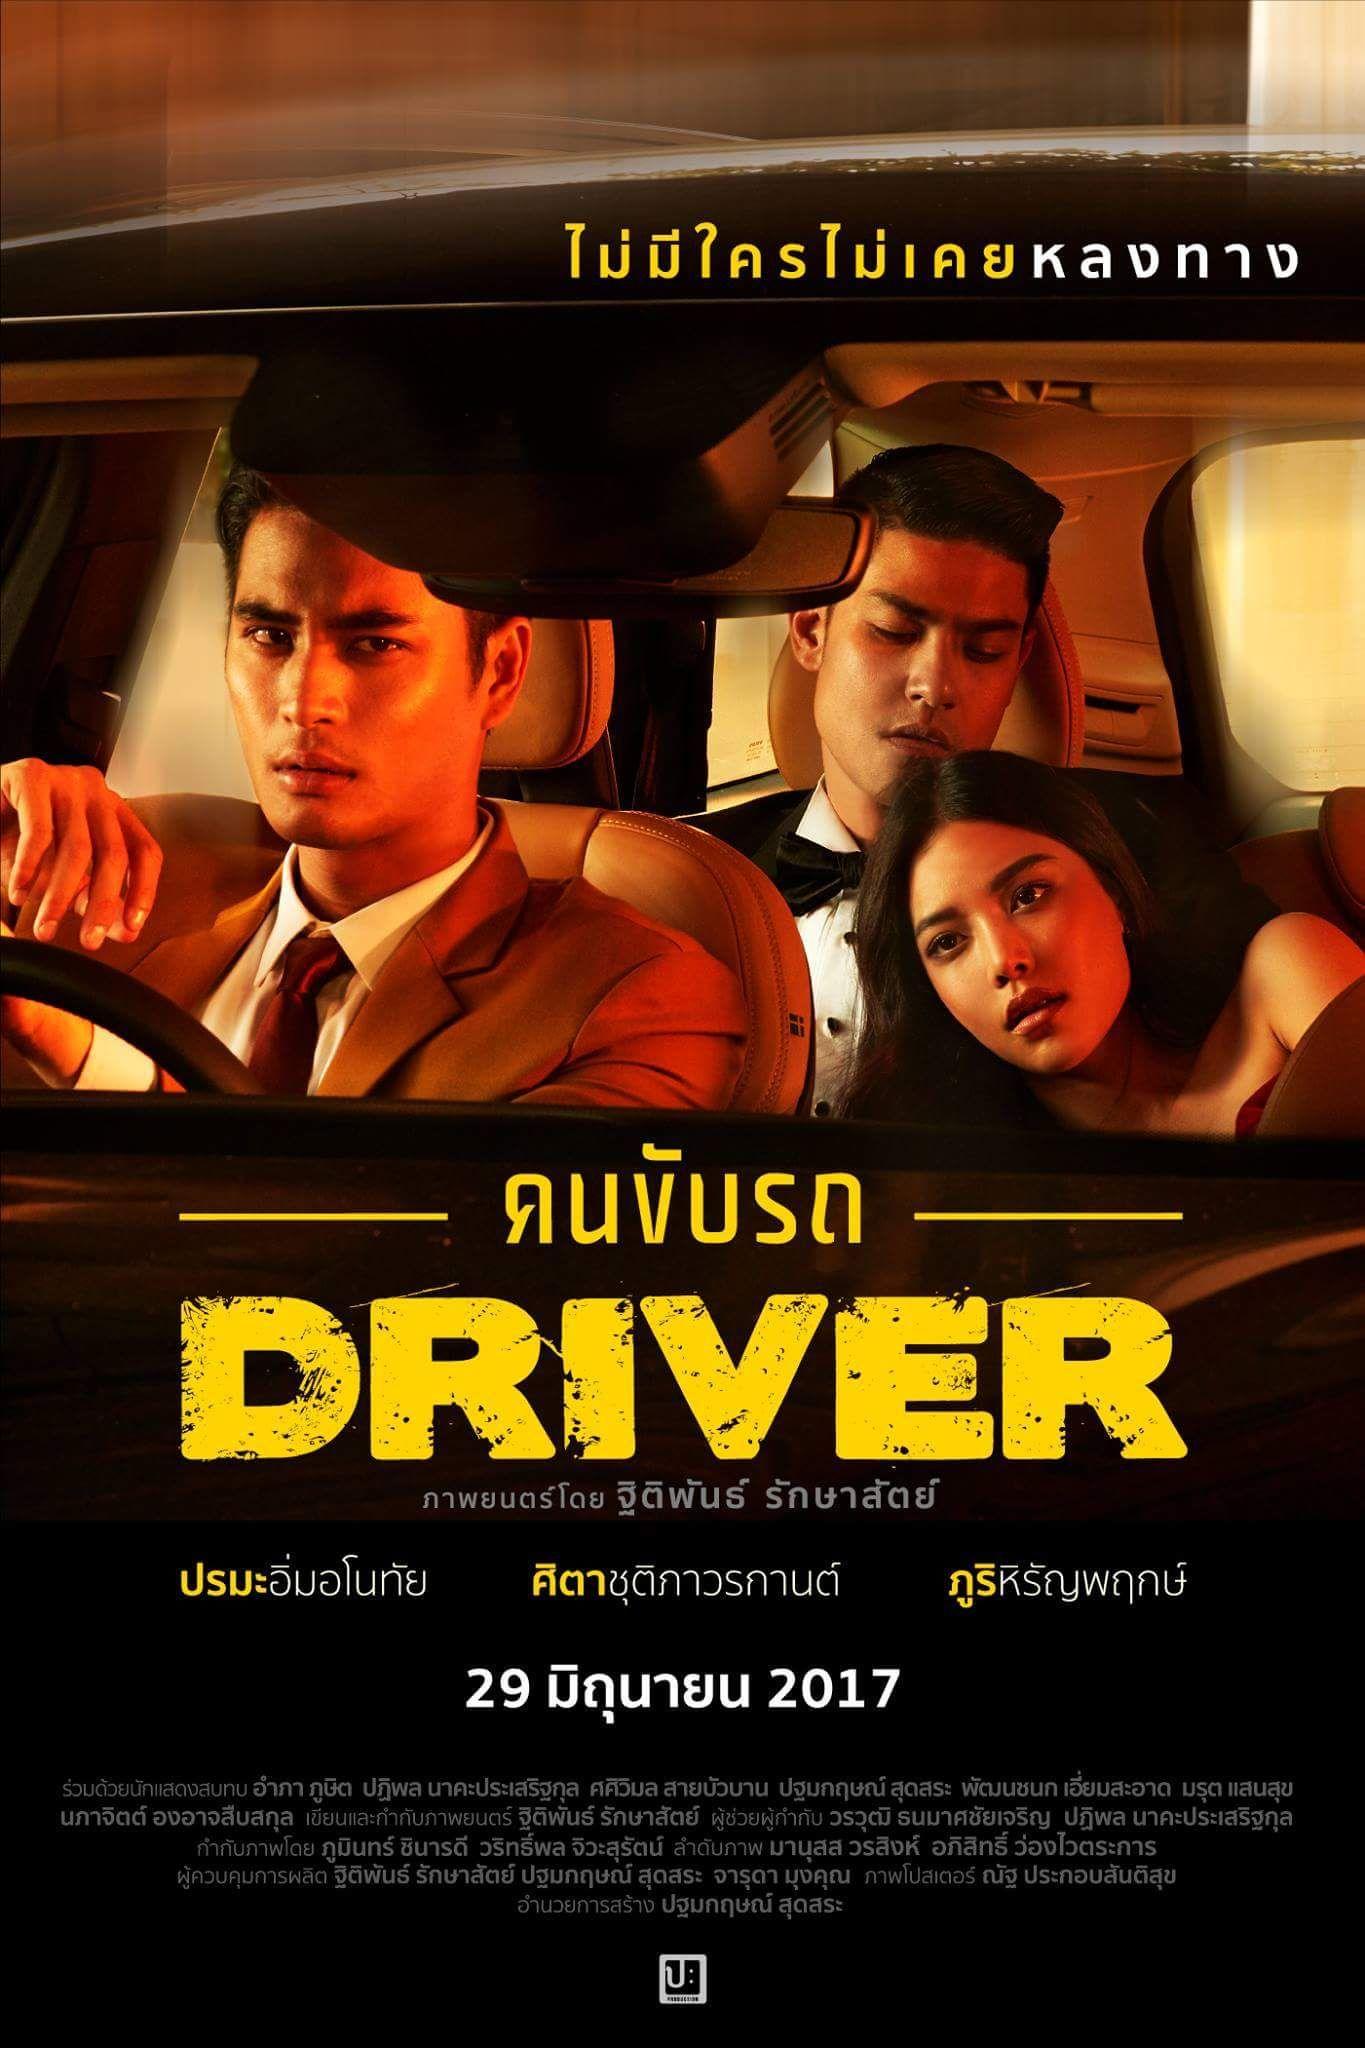 20181122 瞩命情謞 movie night planning drivers movies